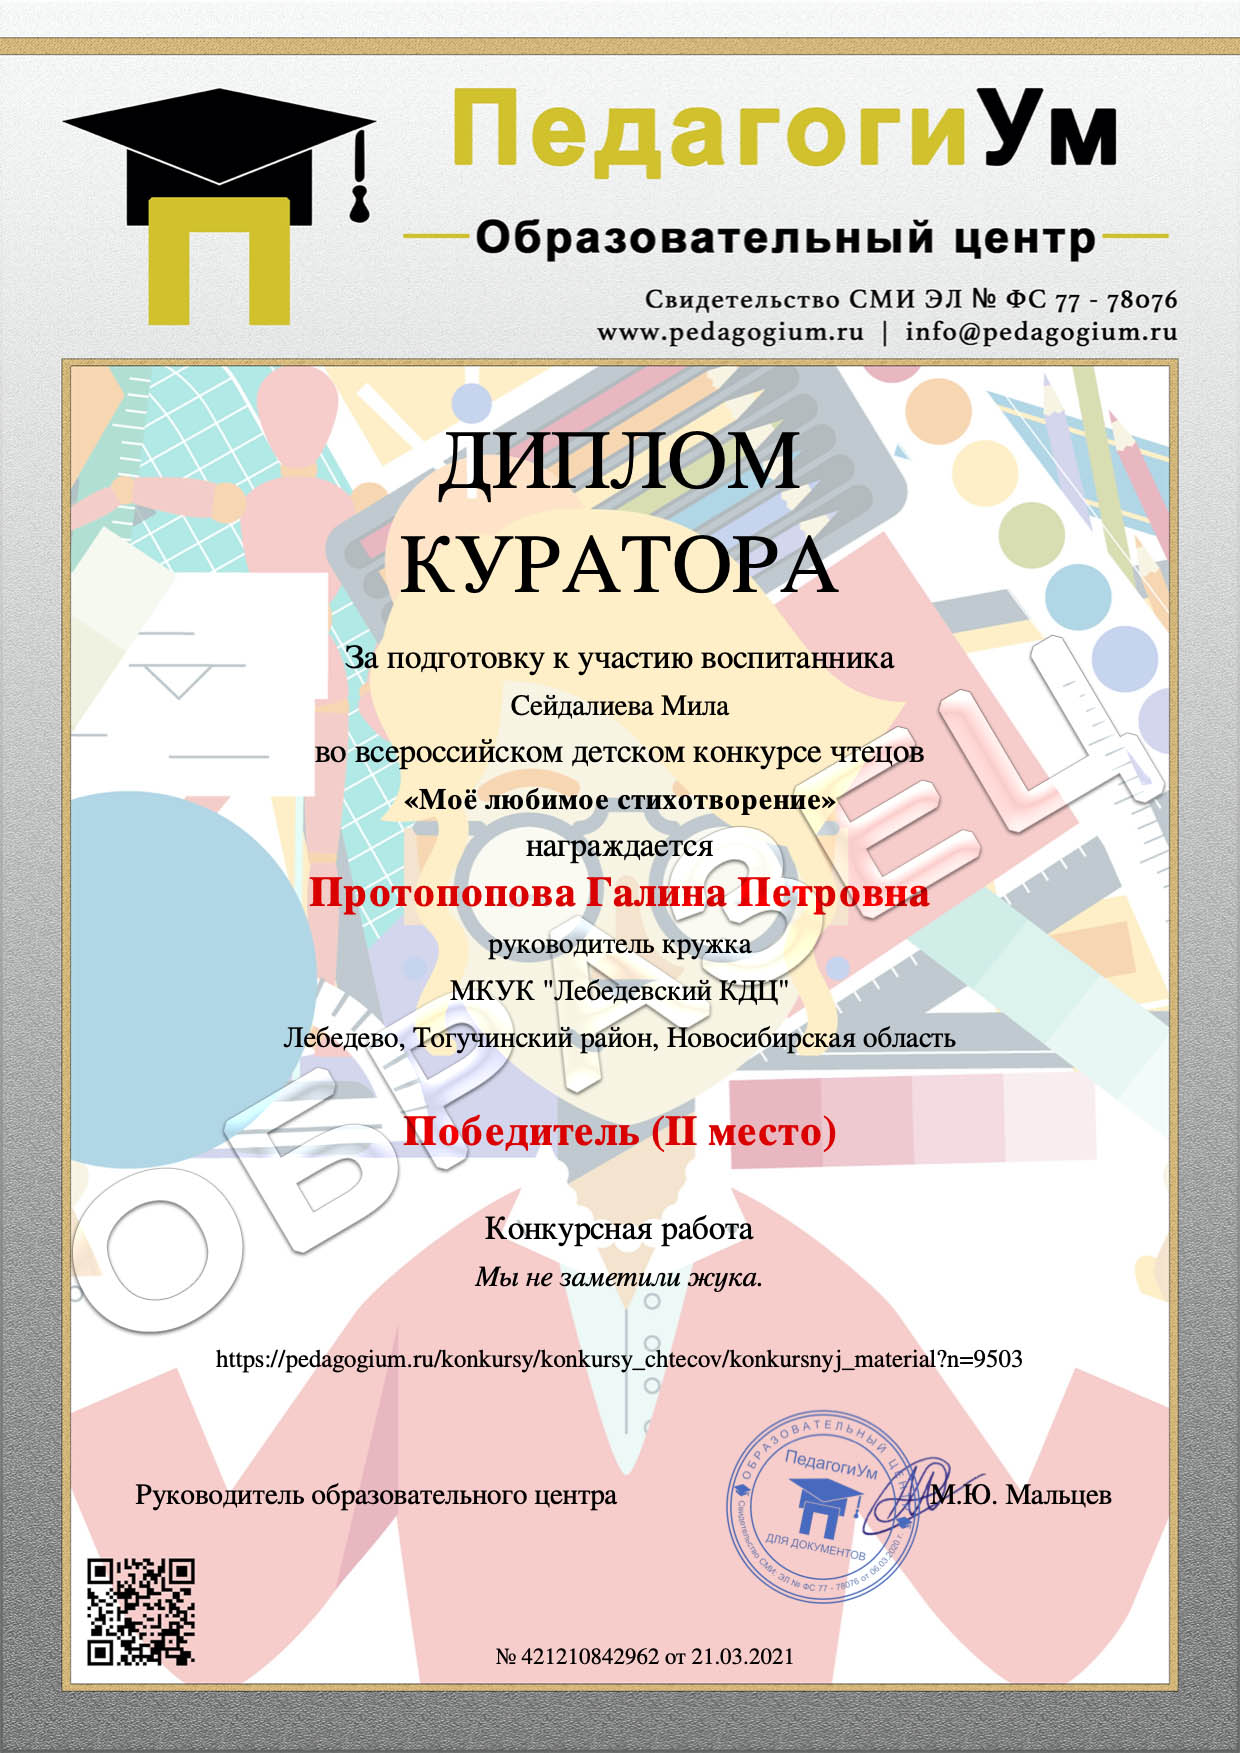 Образец документа педагогу-куратору детского конкурса чтецов центра ПедагогиУм.